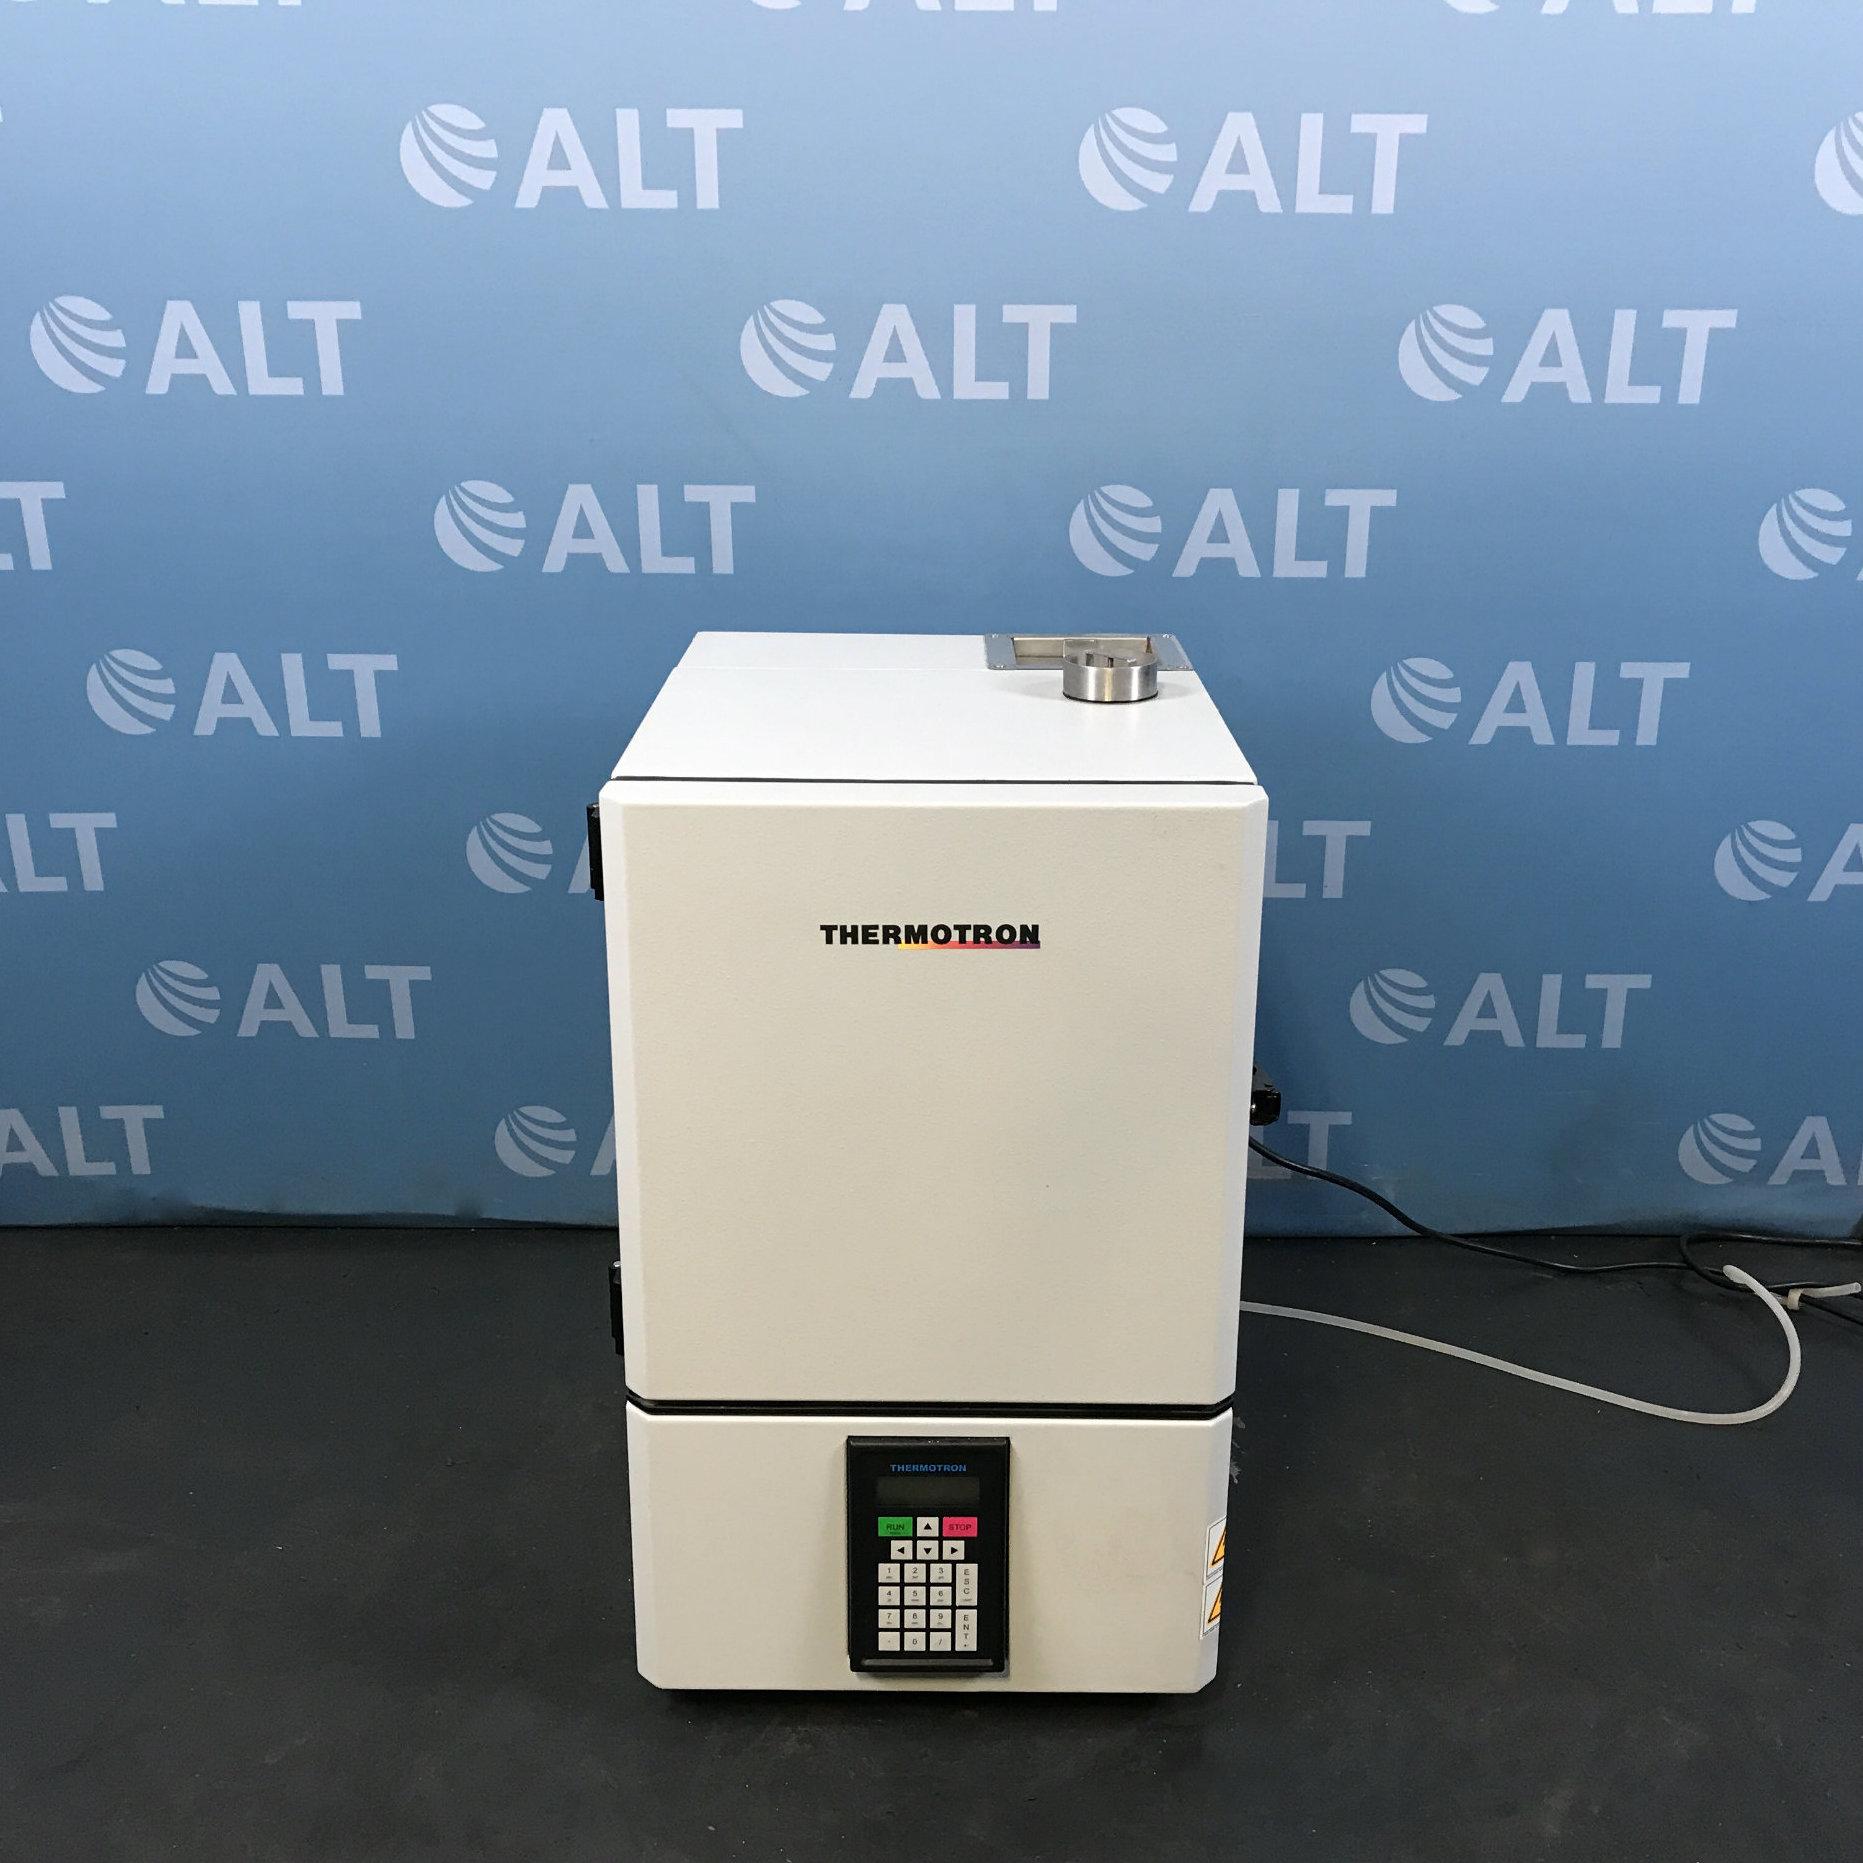 Thermotron Benchtop Environmental Chamber Model SM-1.0-3200 Image